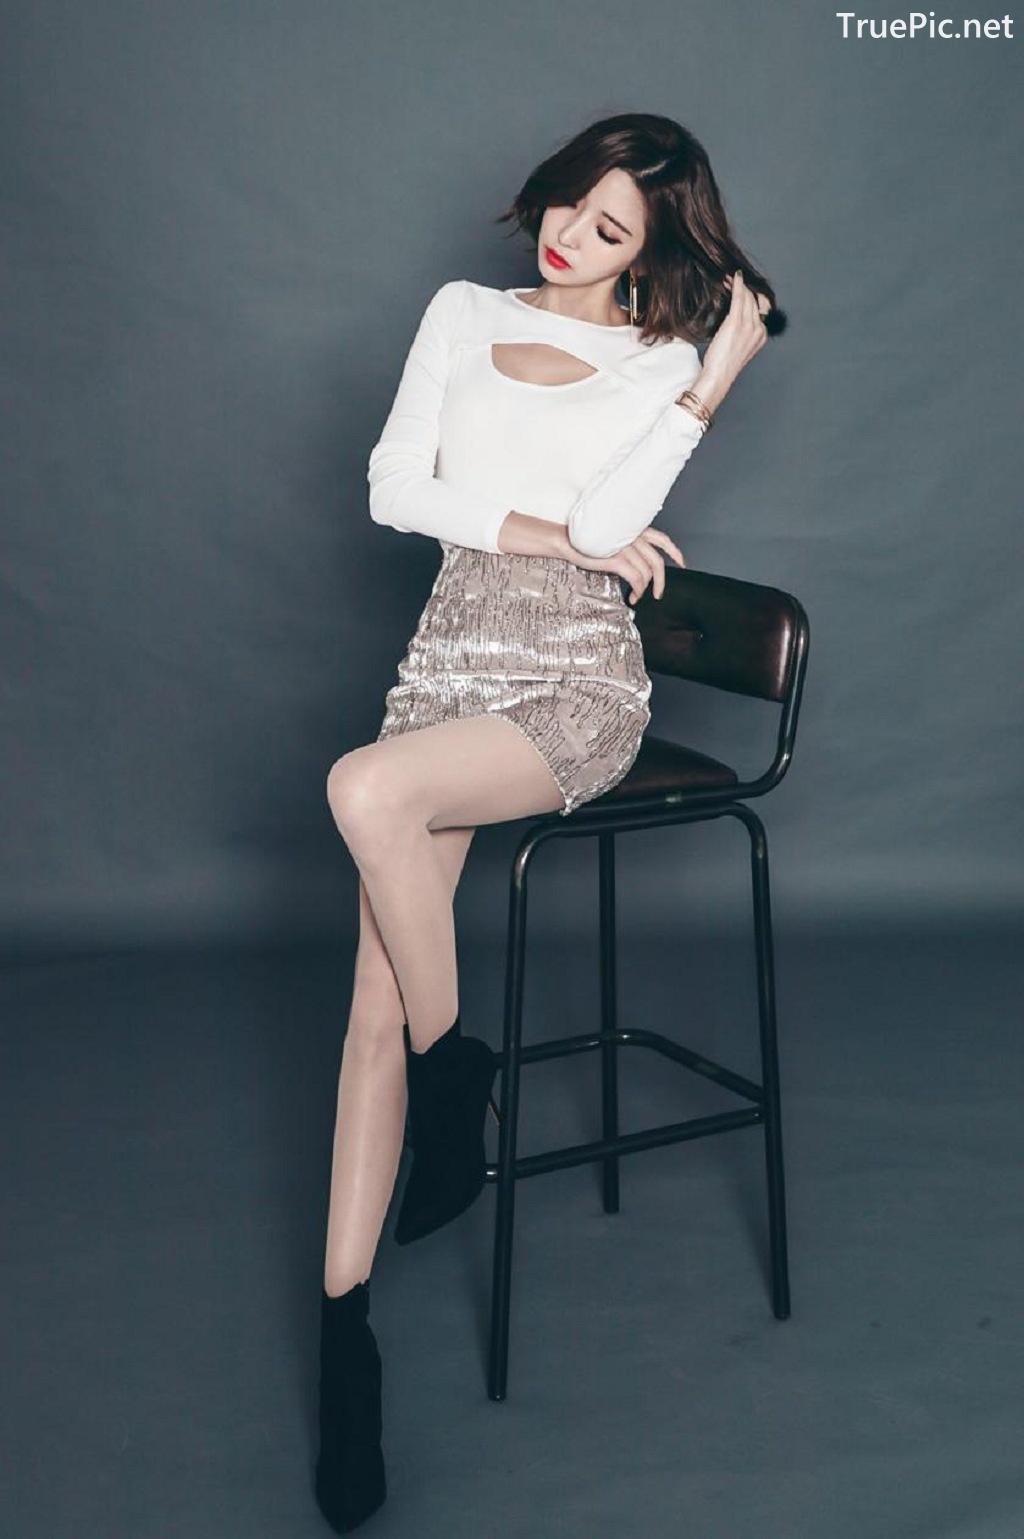 Image Ye Jin - Korean Fashion Model - Studio Photoshoot Collection - TruePic.net - Picture-4